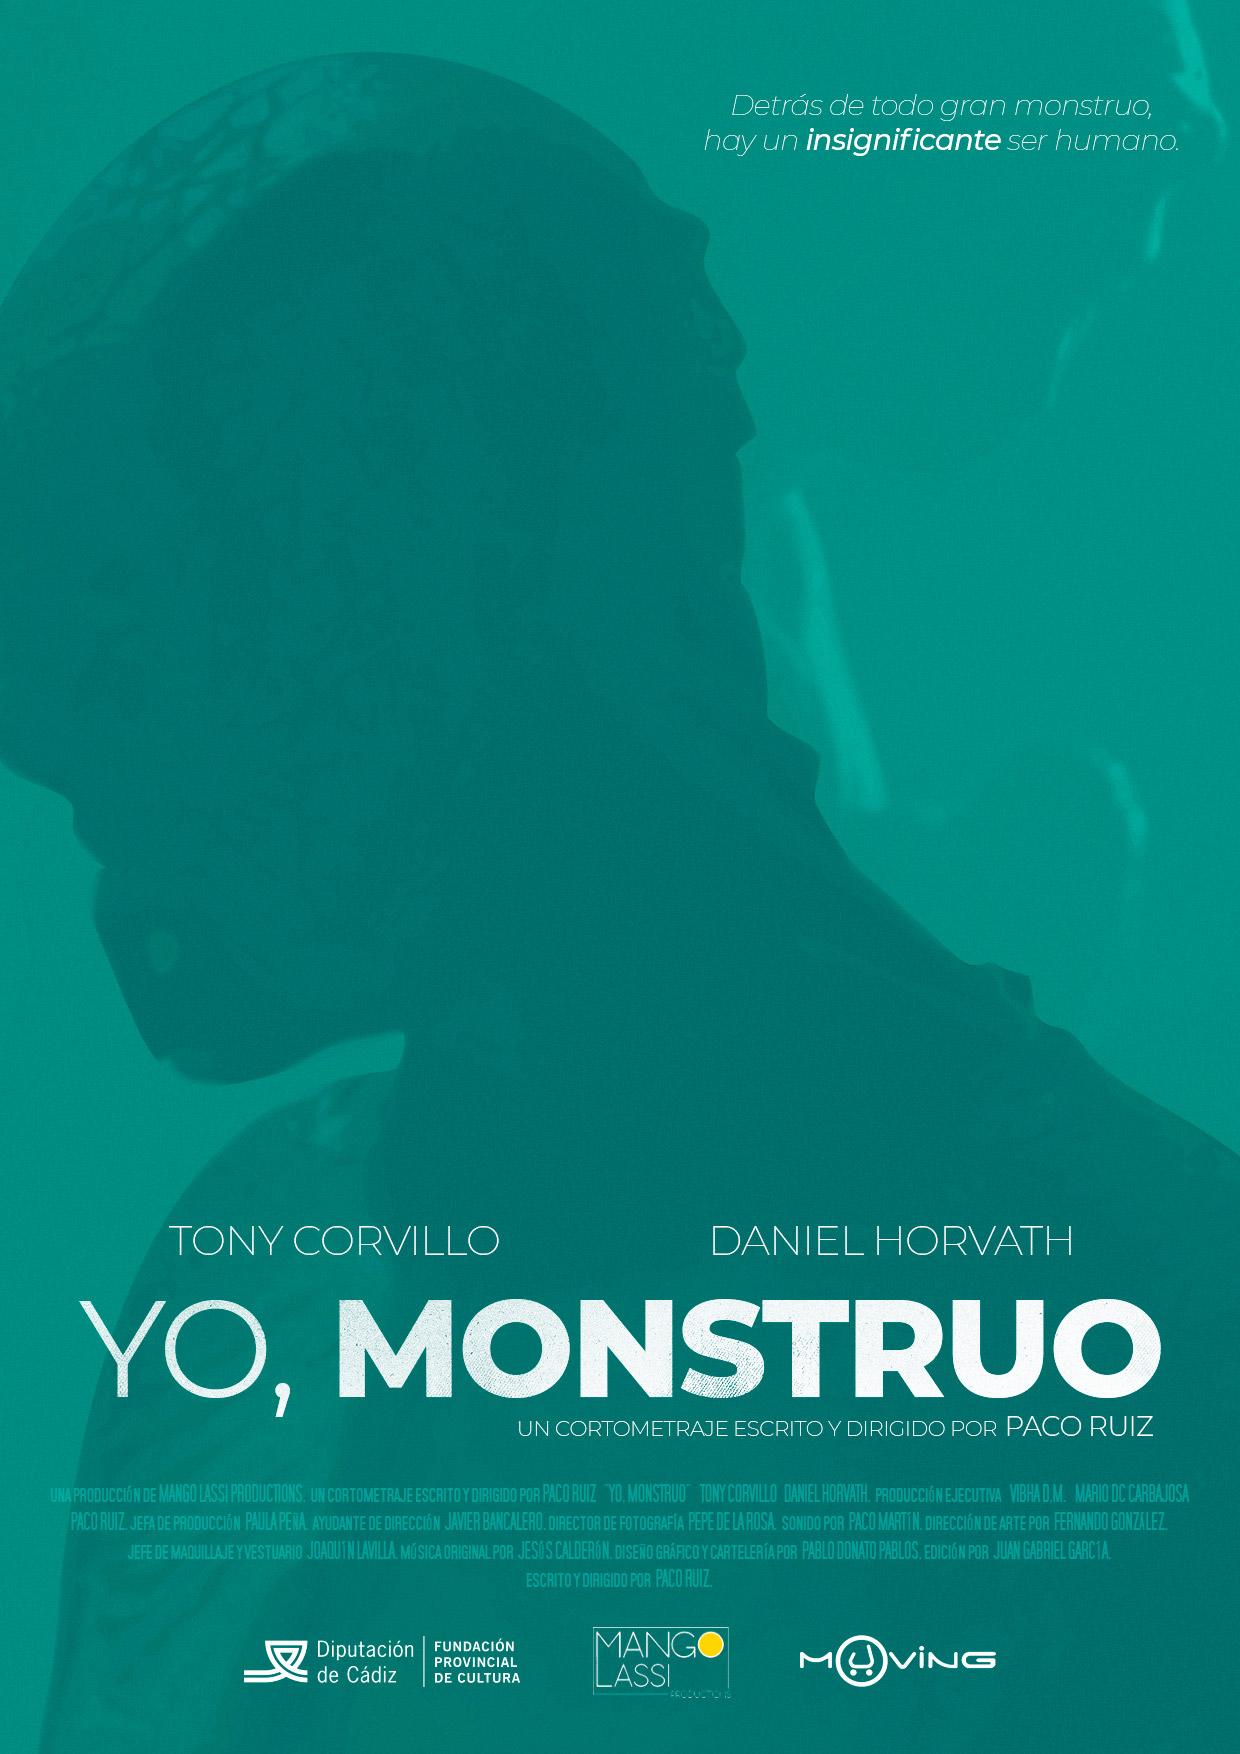 Yo, Monstruo